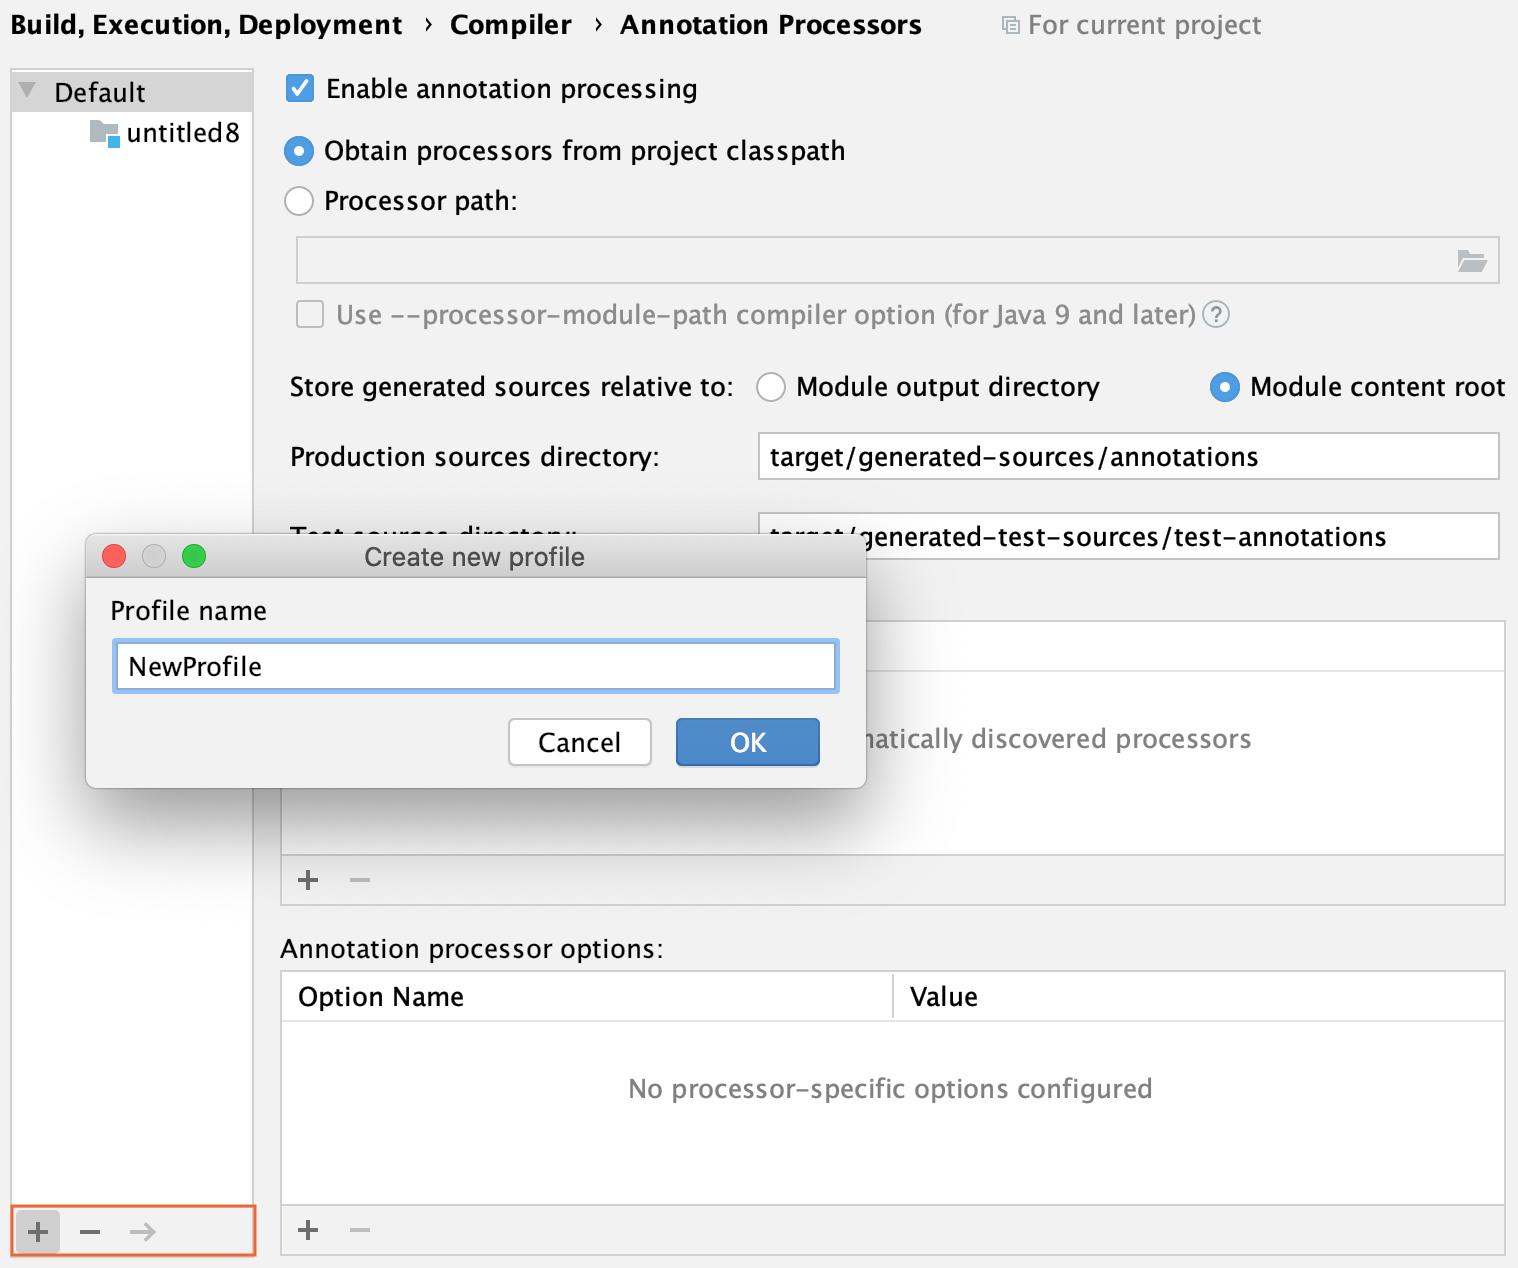 Create the annotation processor profile